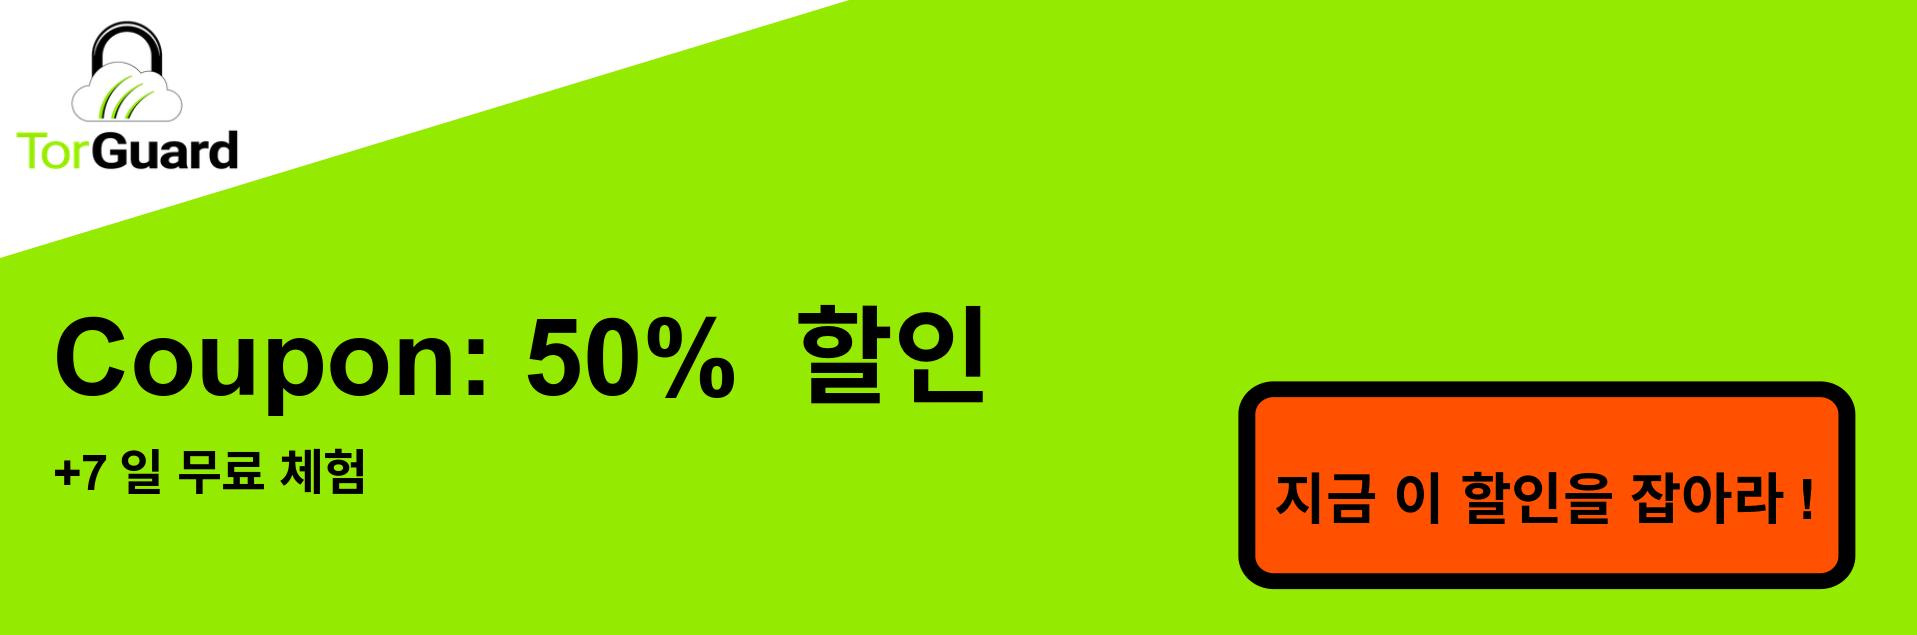 TorGuard VPN 쿠폰 배너-50 % 할인